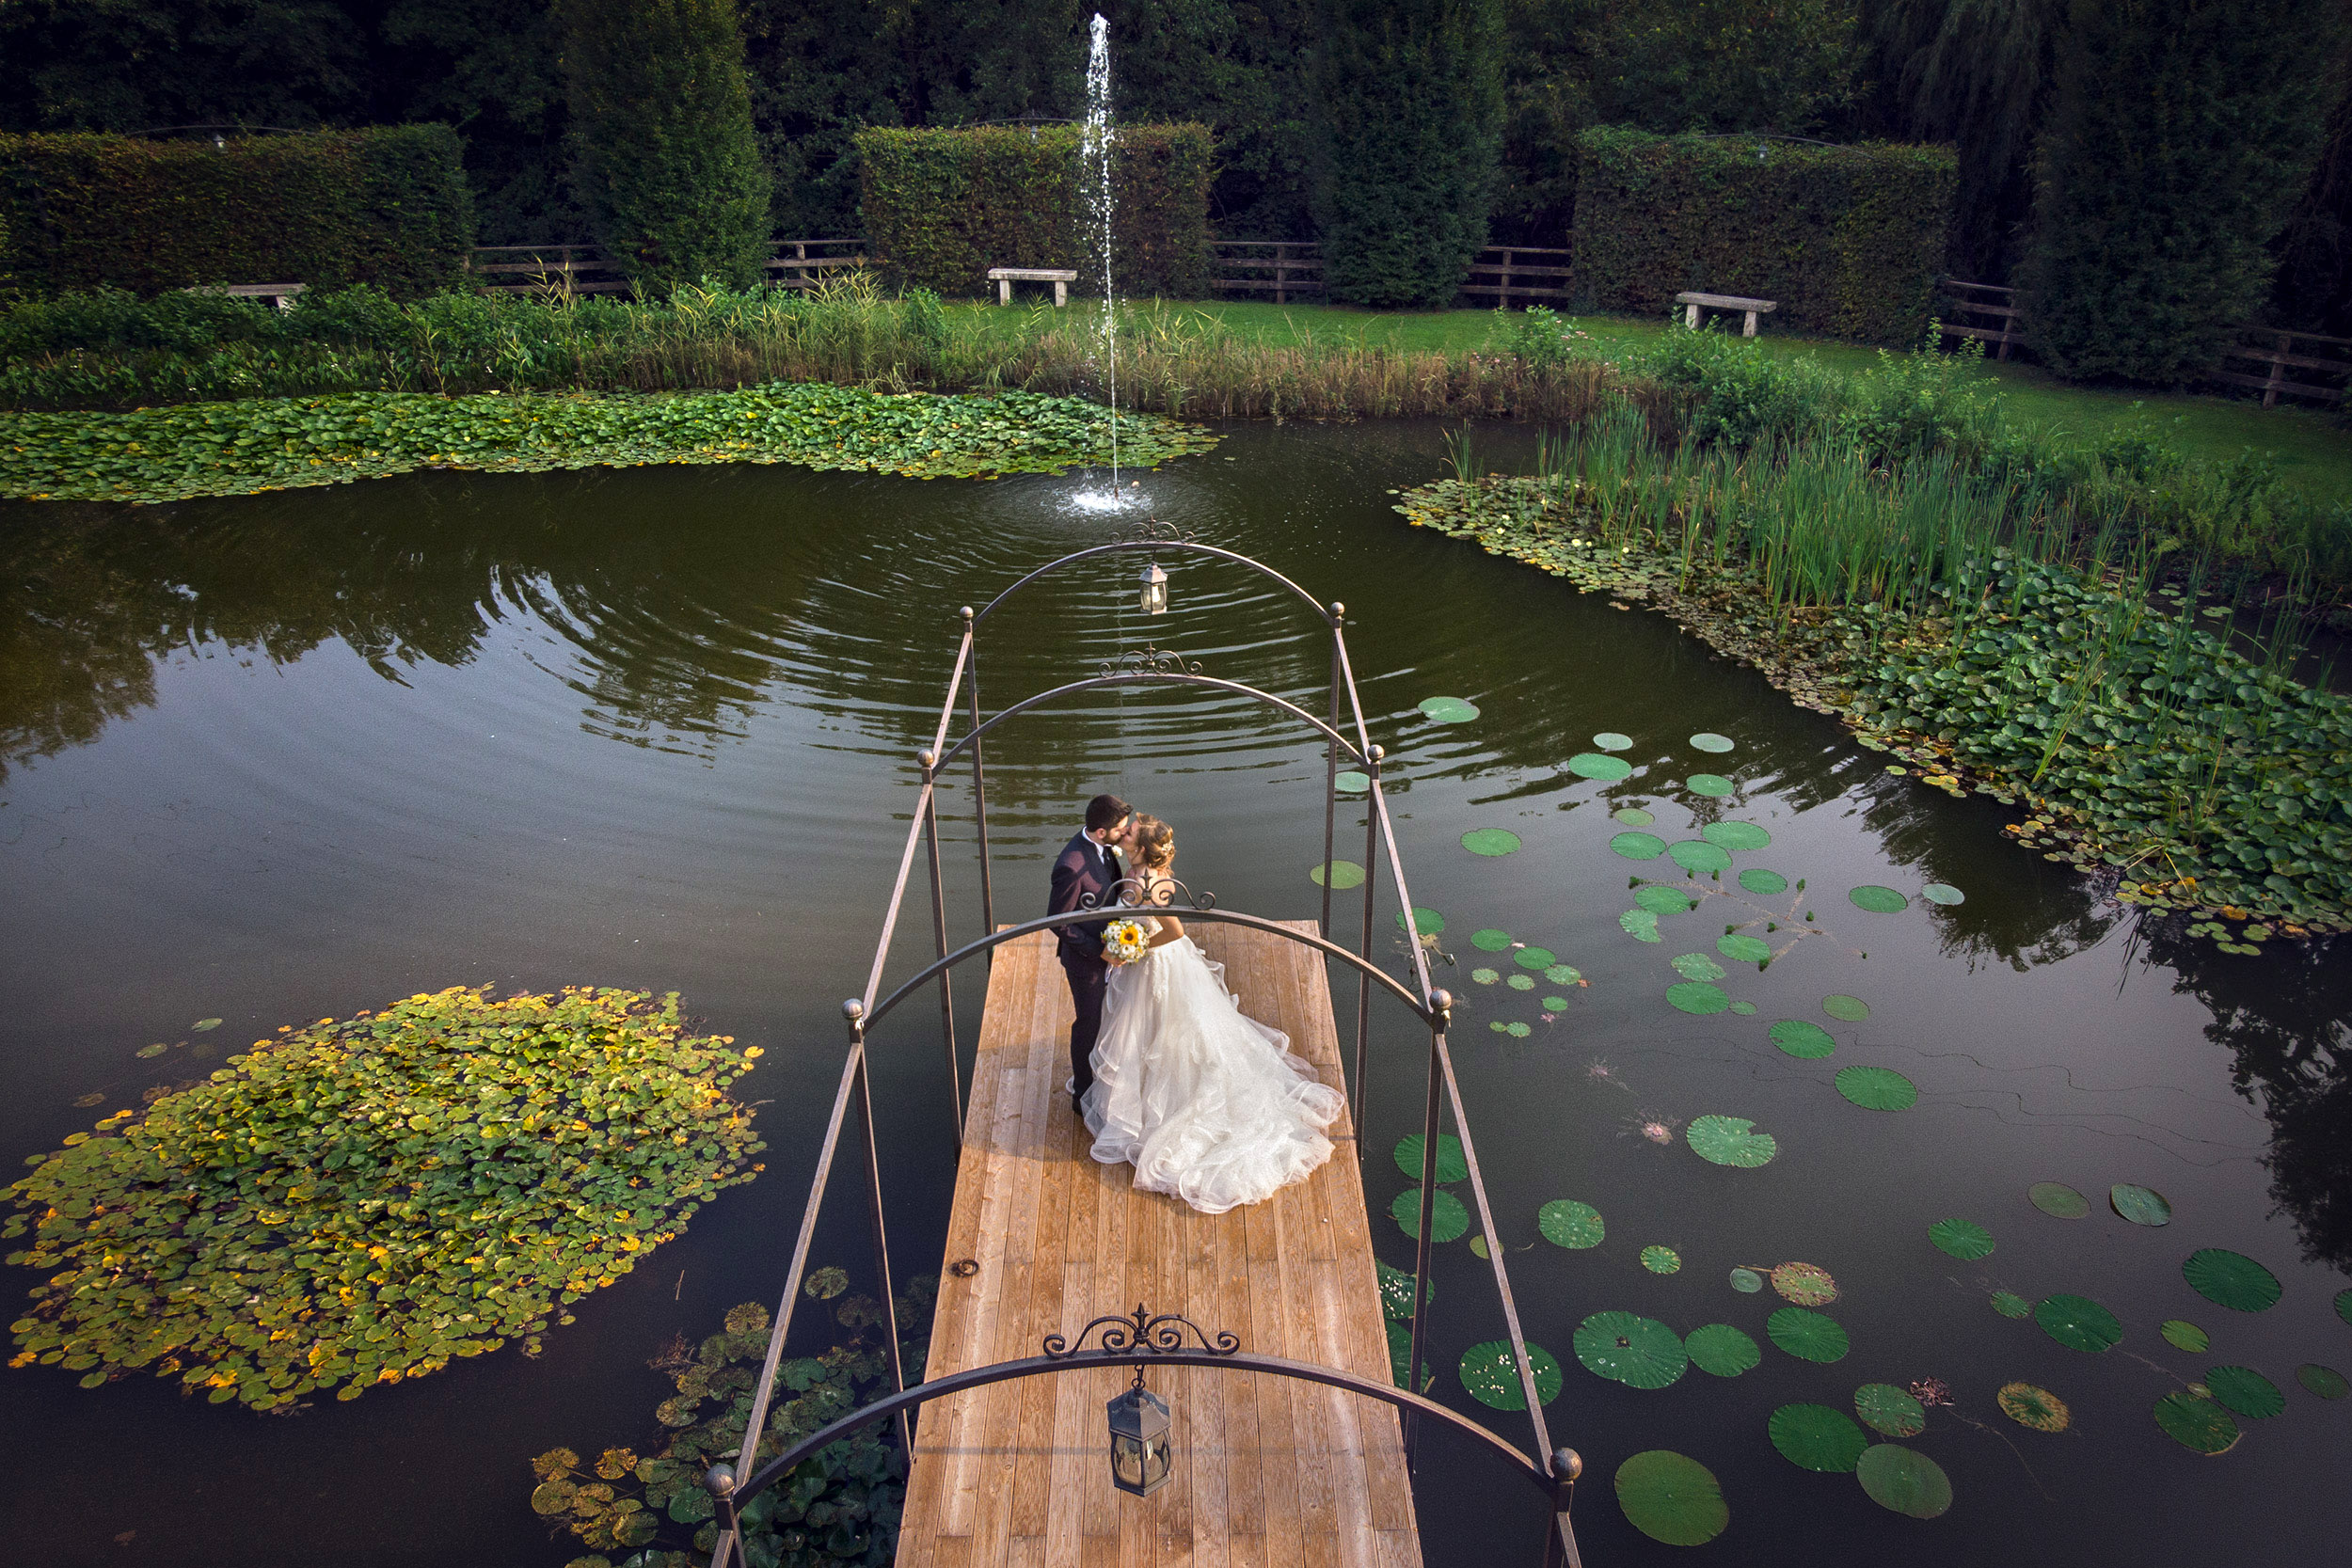 001 foto matrimonio reportage wedding gandosso bergamo il fontanile 2